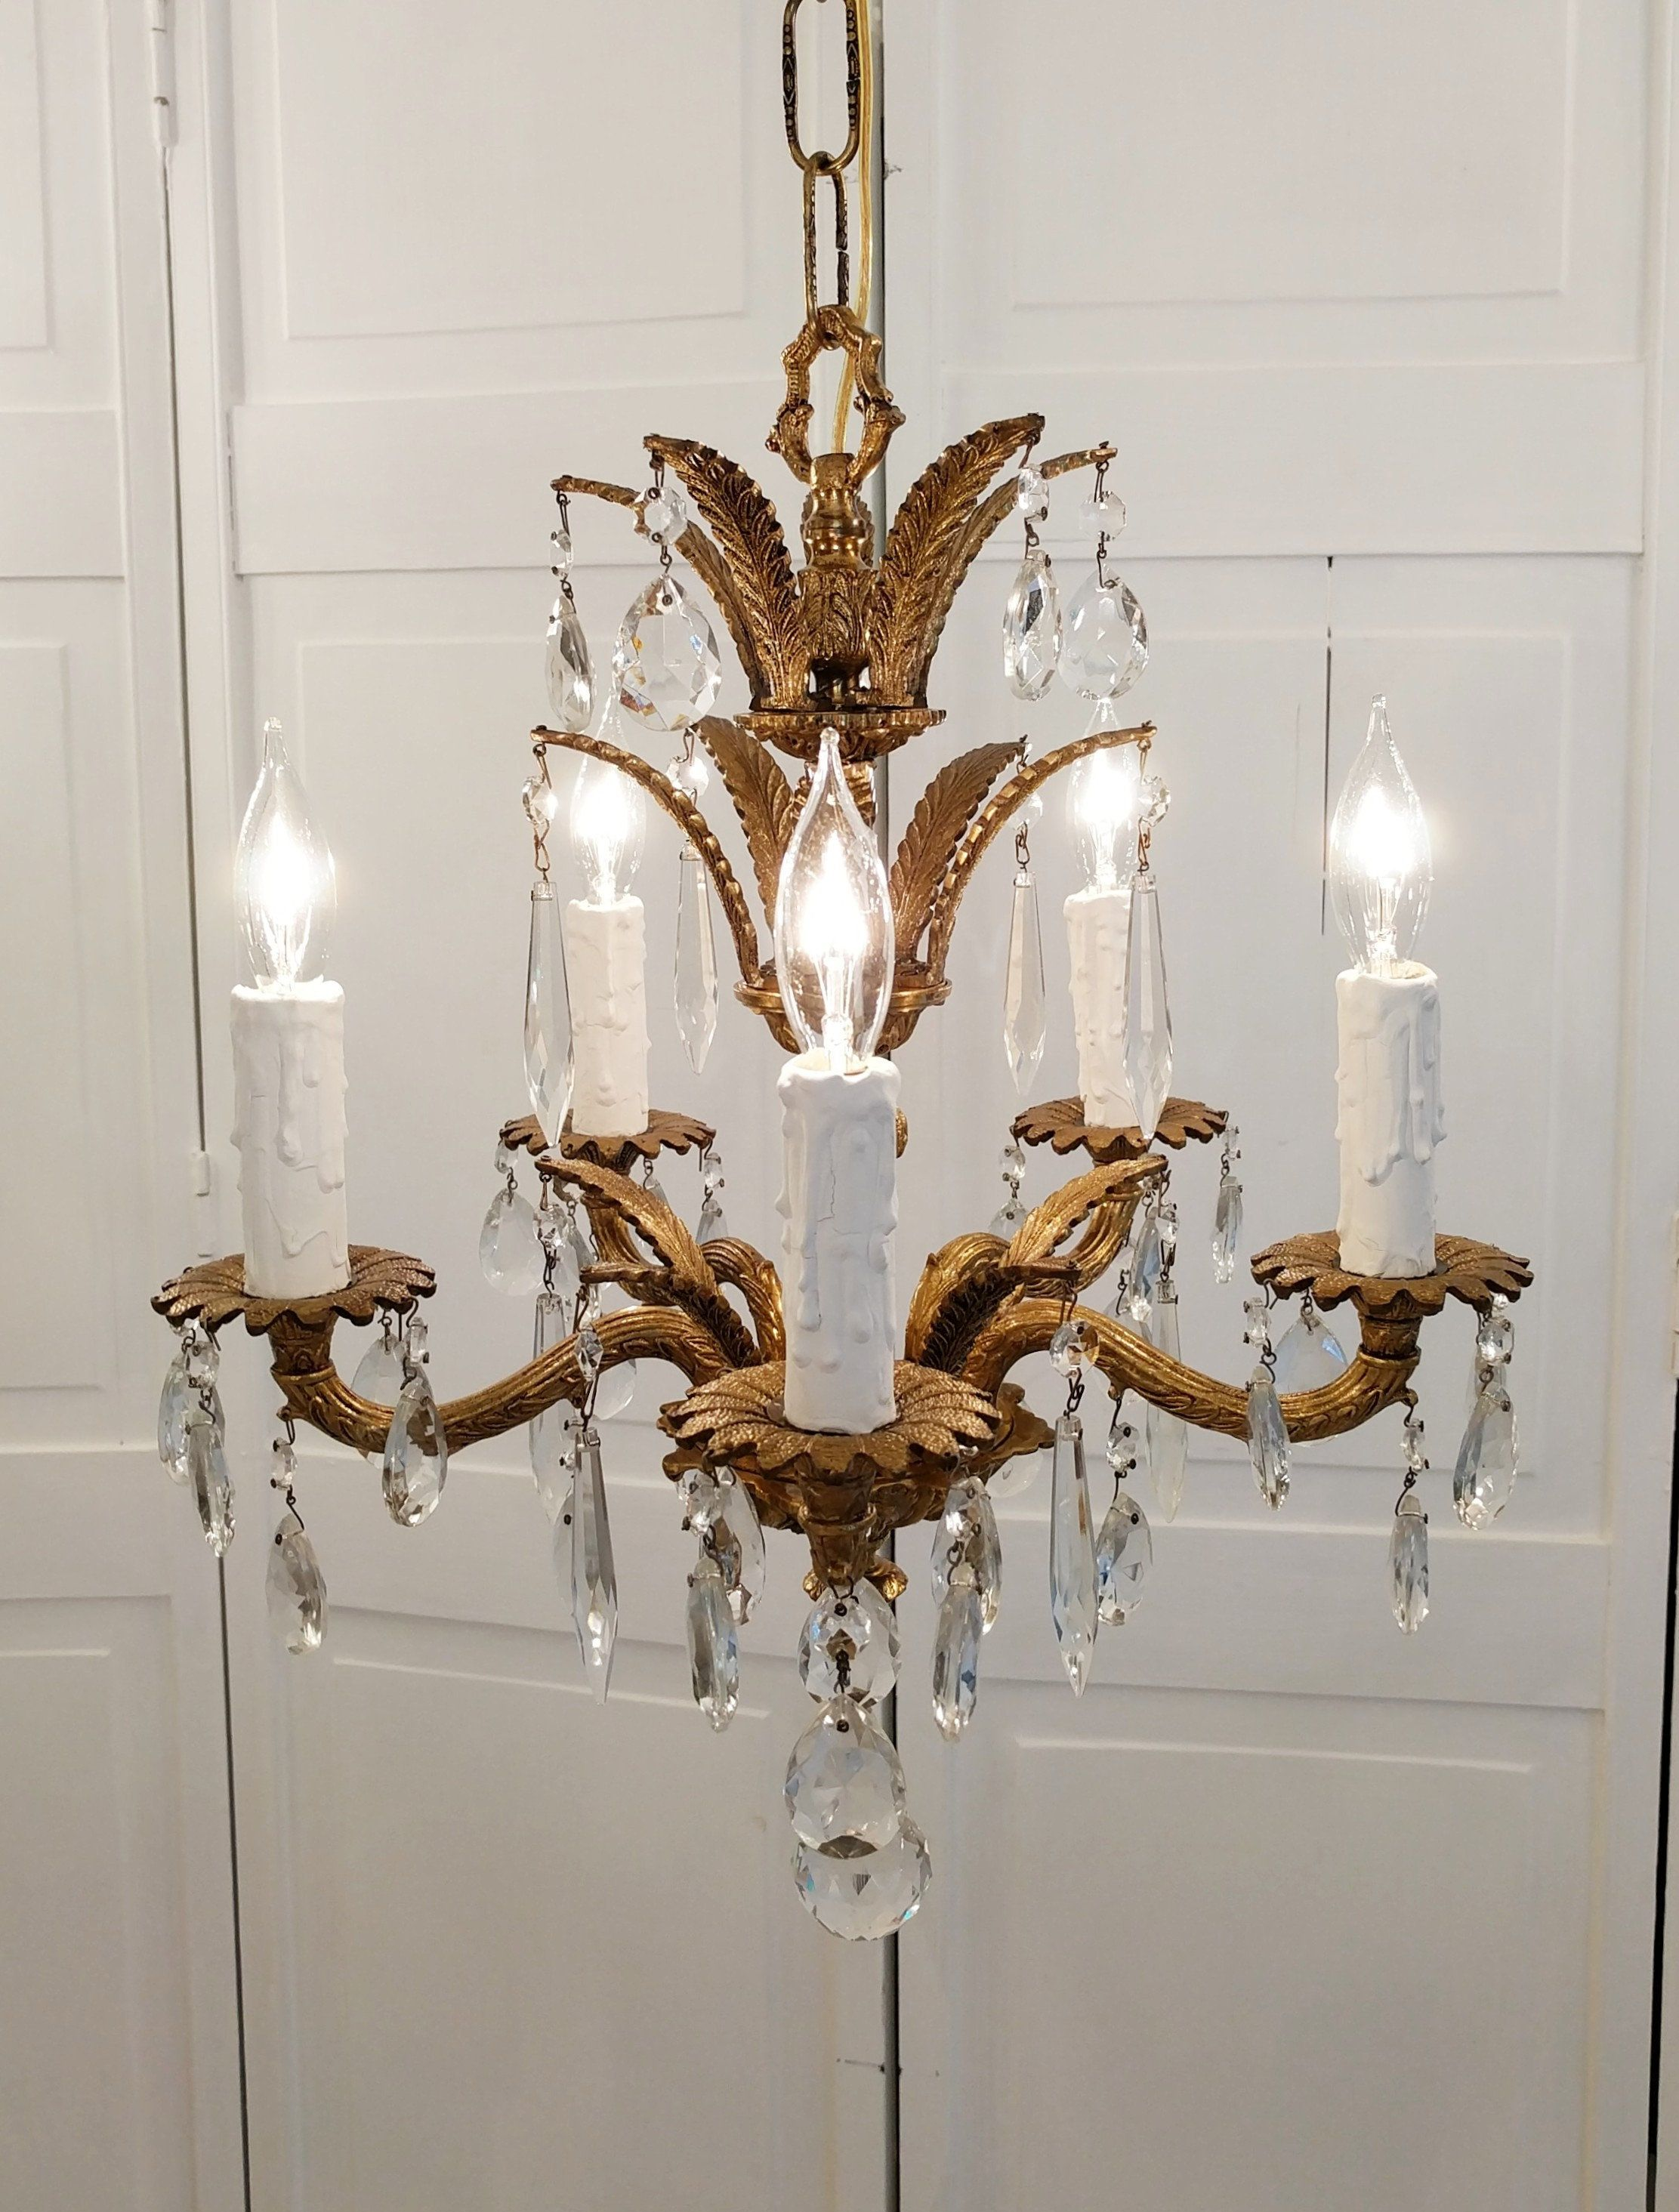 Vintage Chandelier Antique Chandelier Ornate Spanish Brass Bespoke